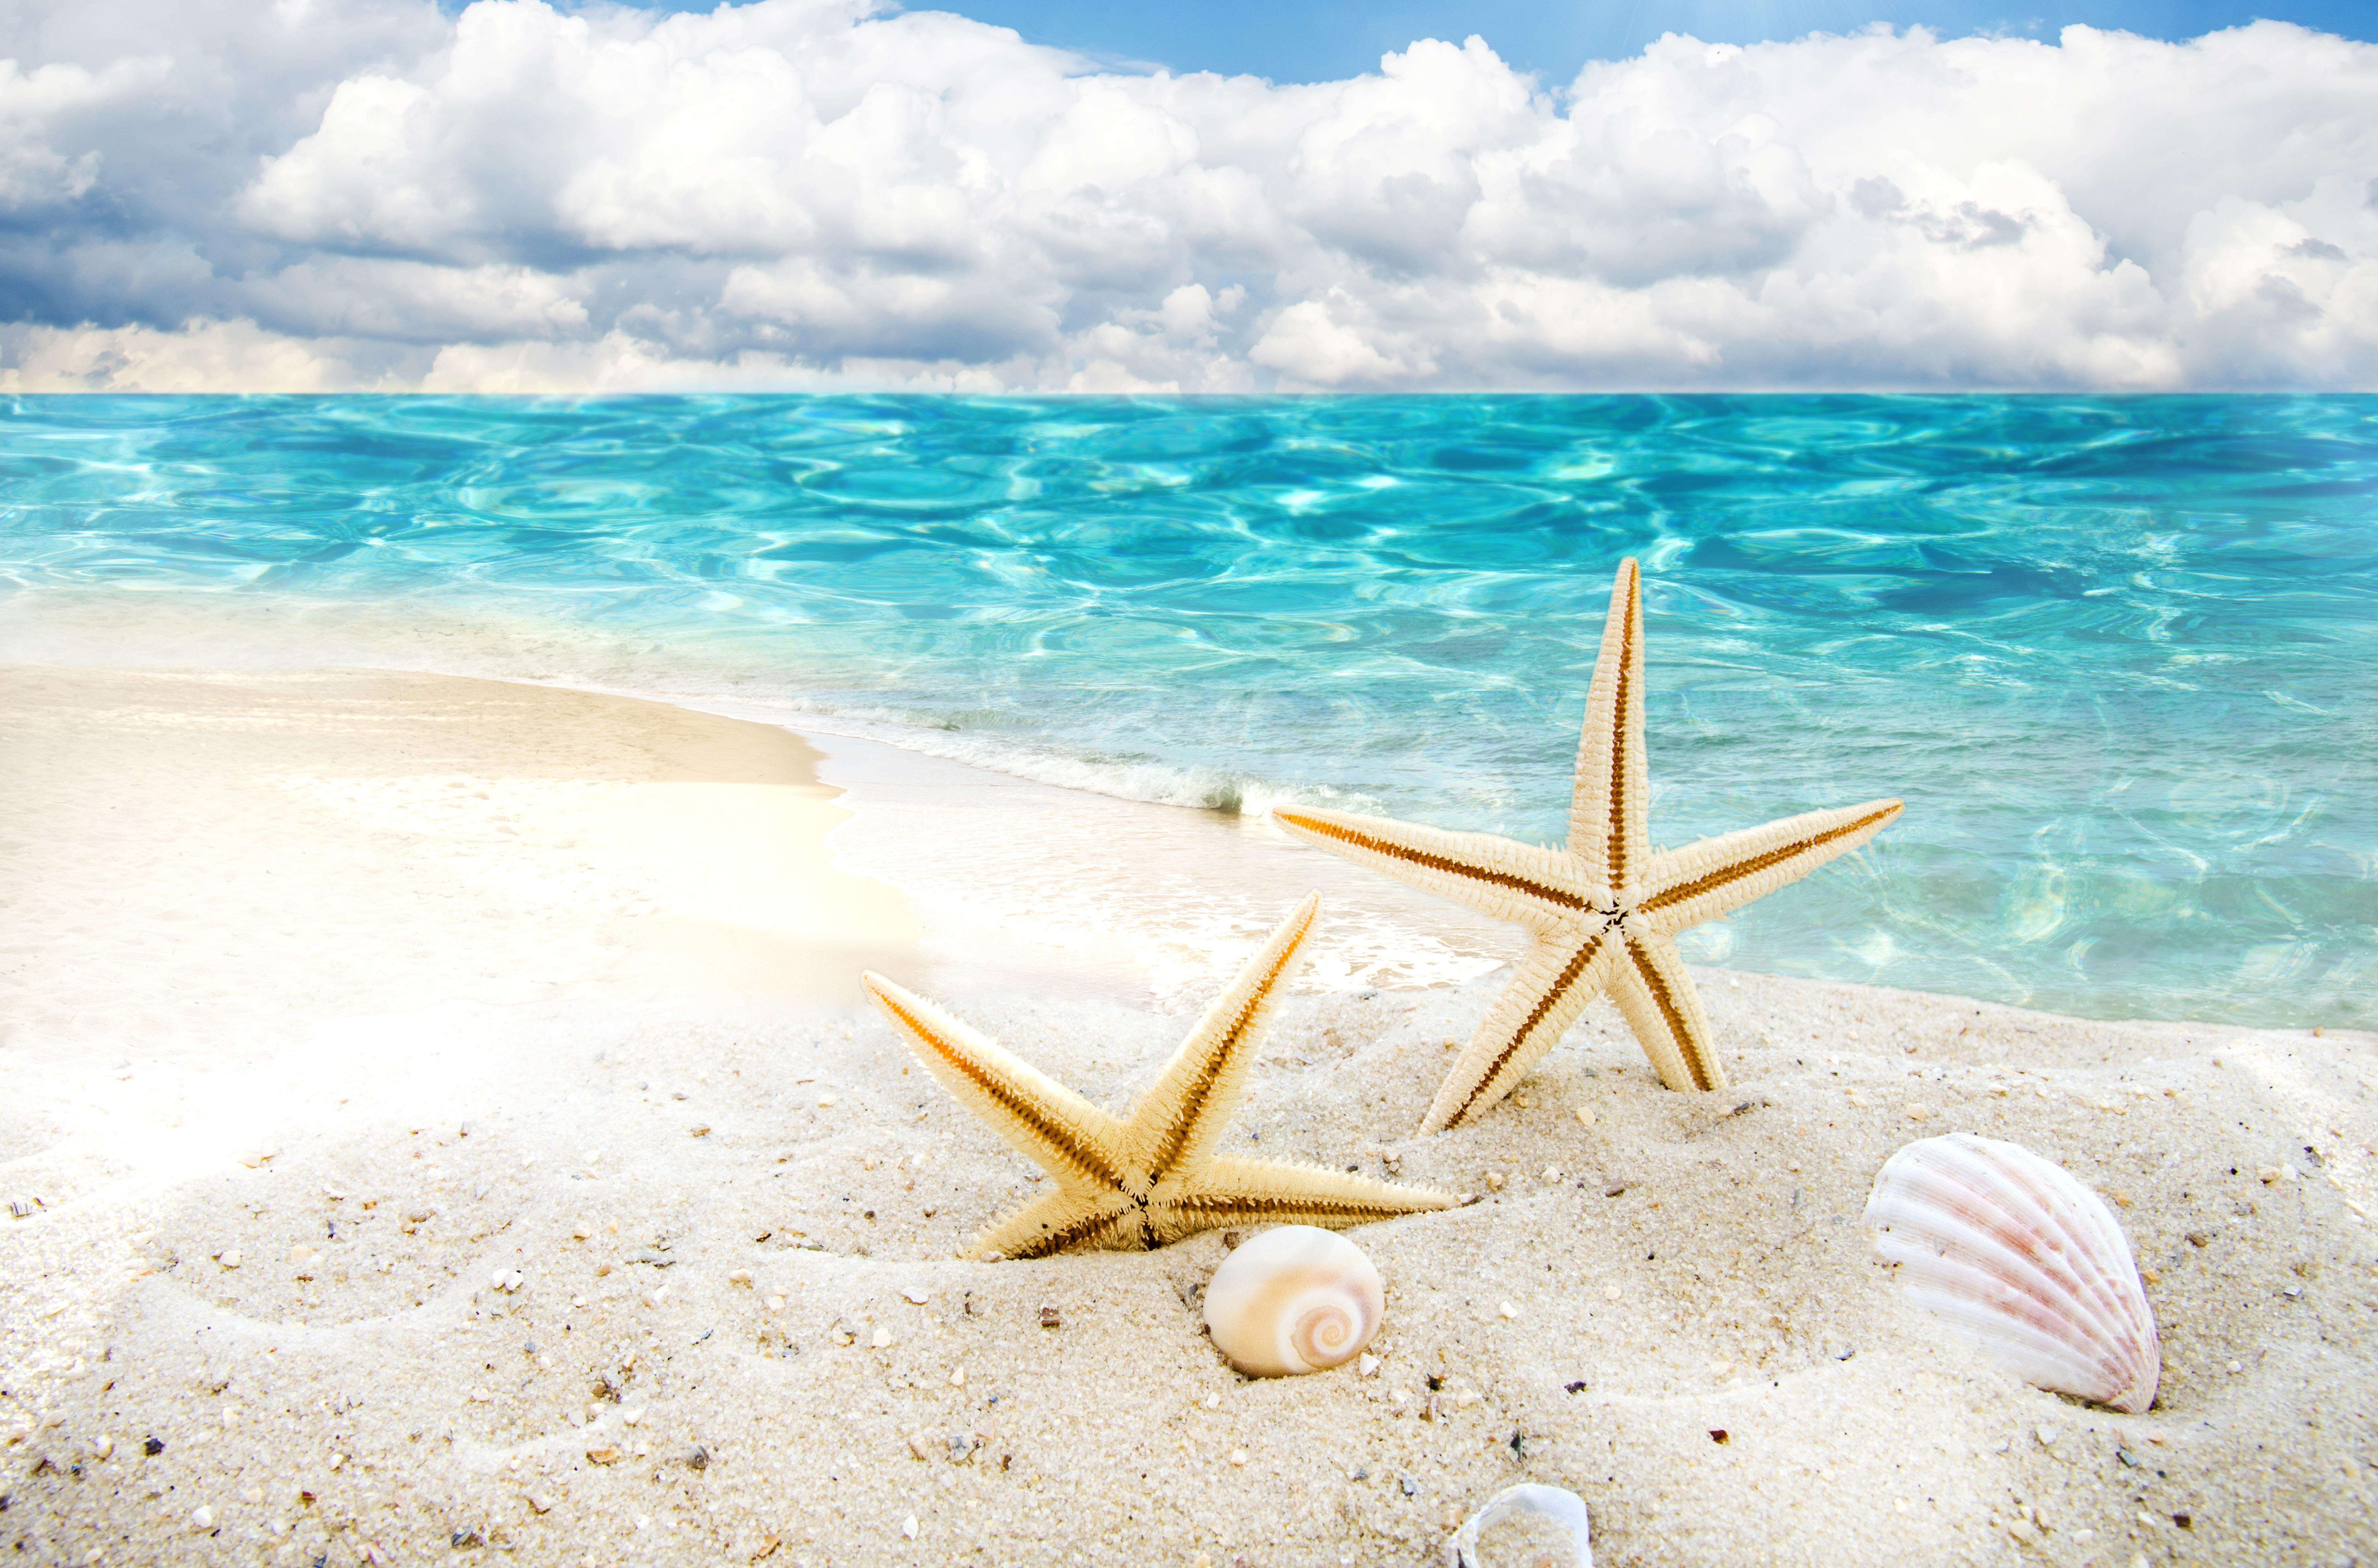 природа горизонт море морская звезда  № 623105 бесплатно